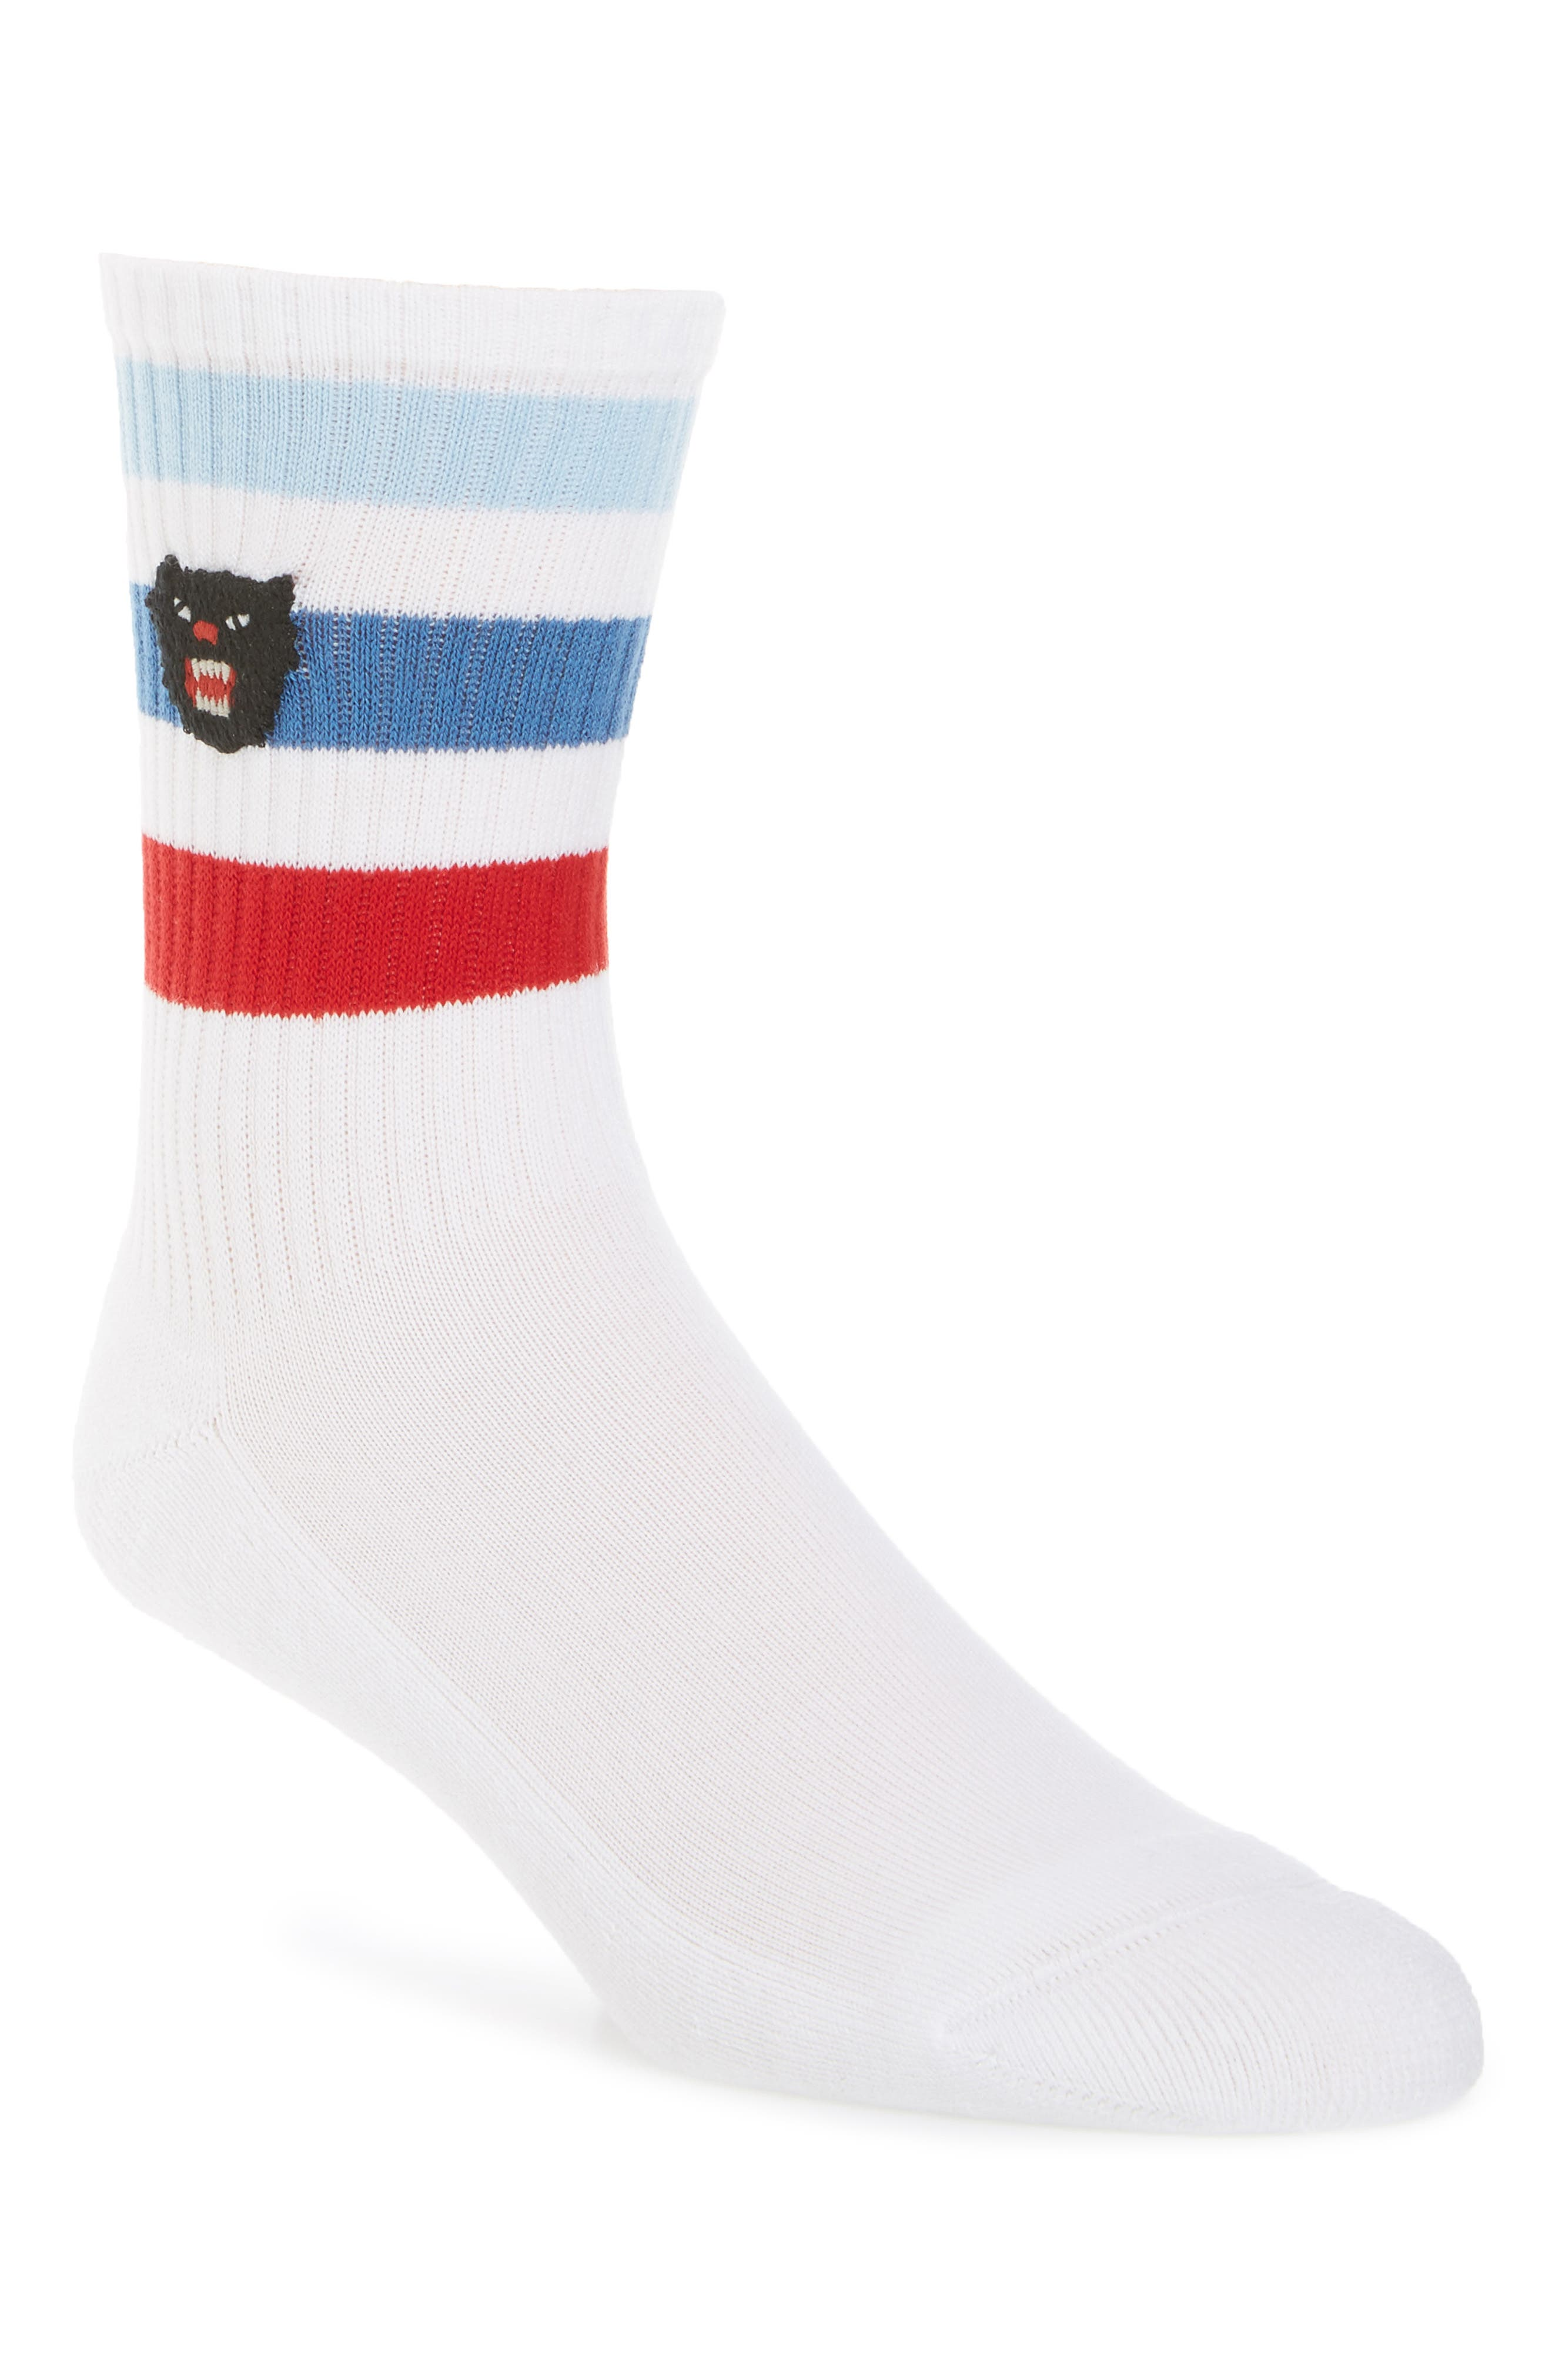 Puma Patch Socks,                             Main thumbnail 1, color,                             White